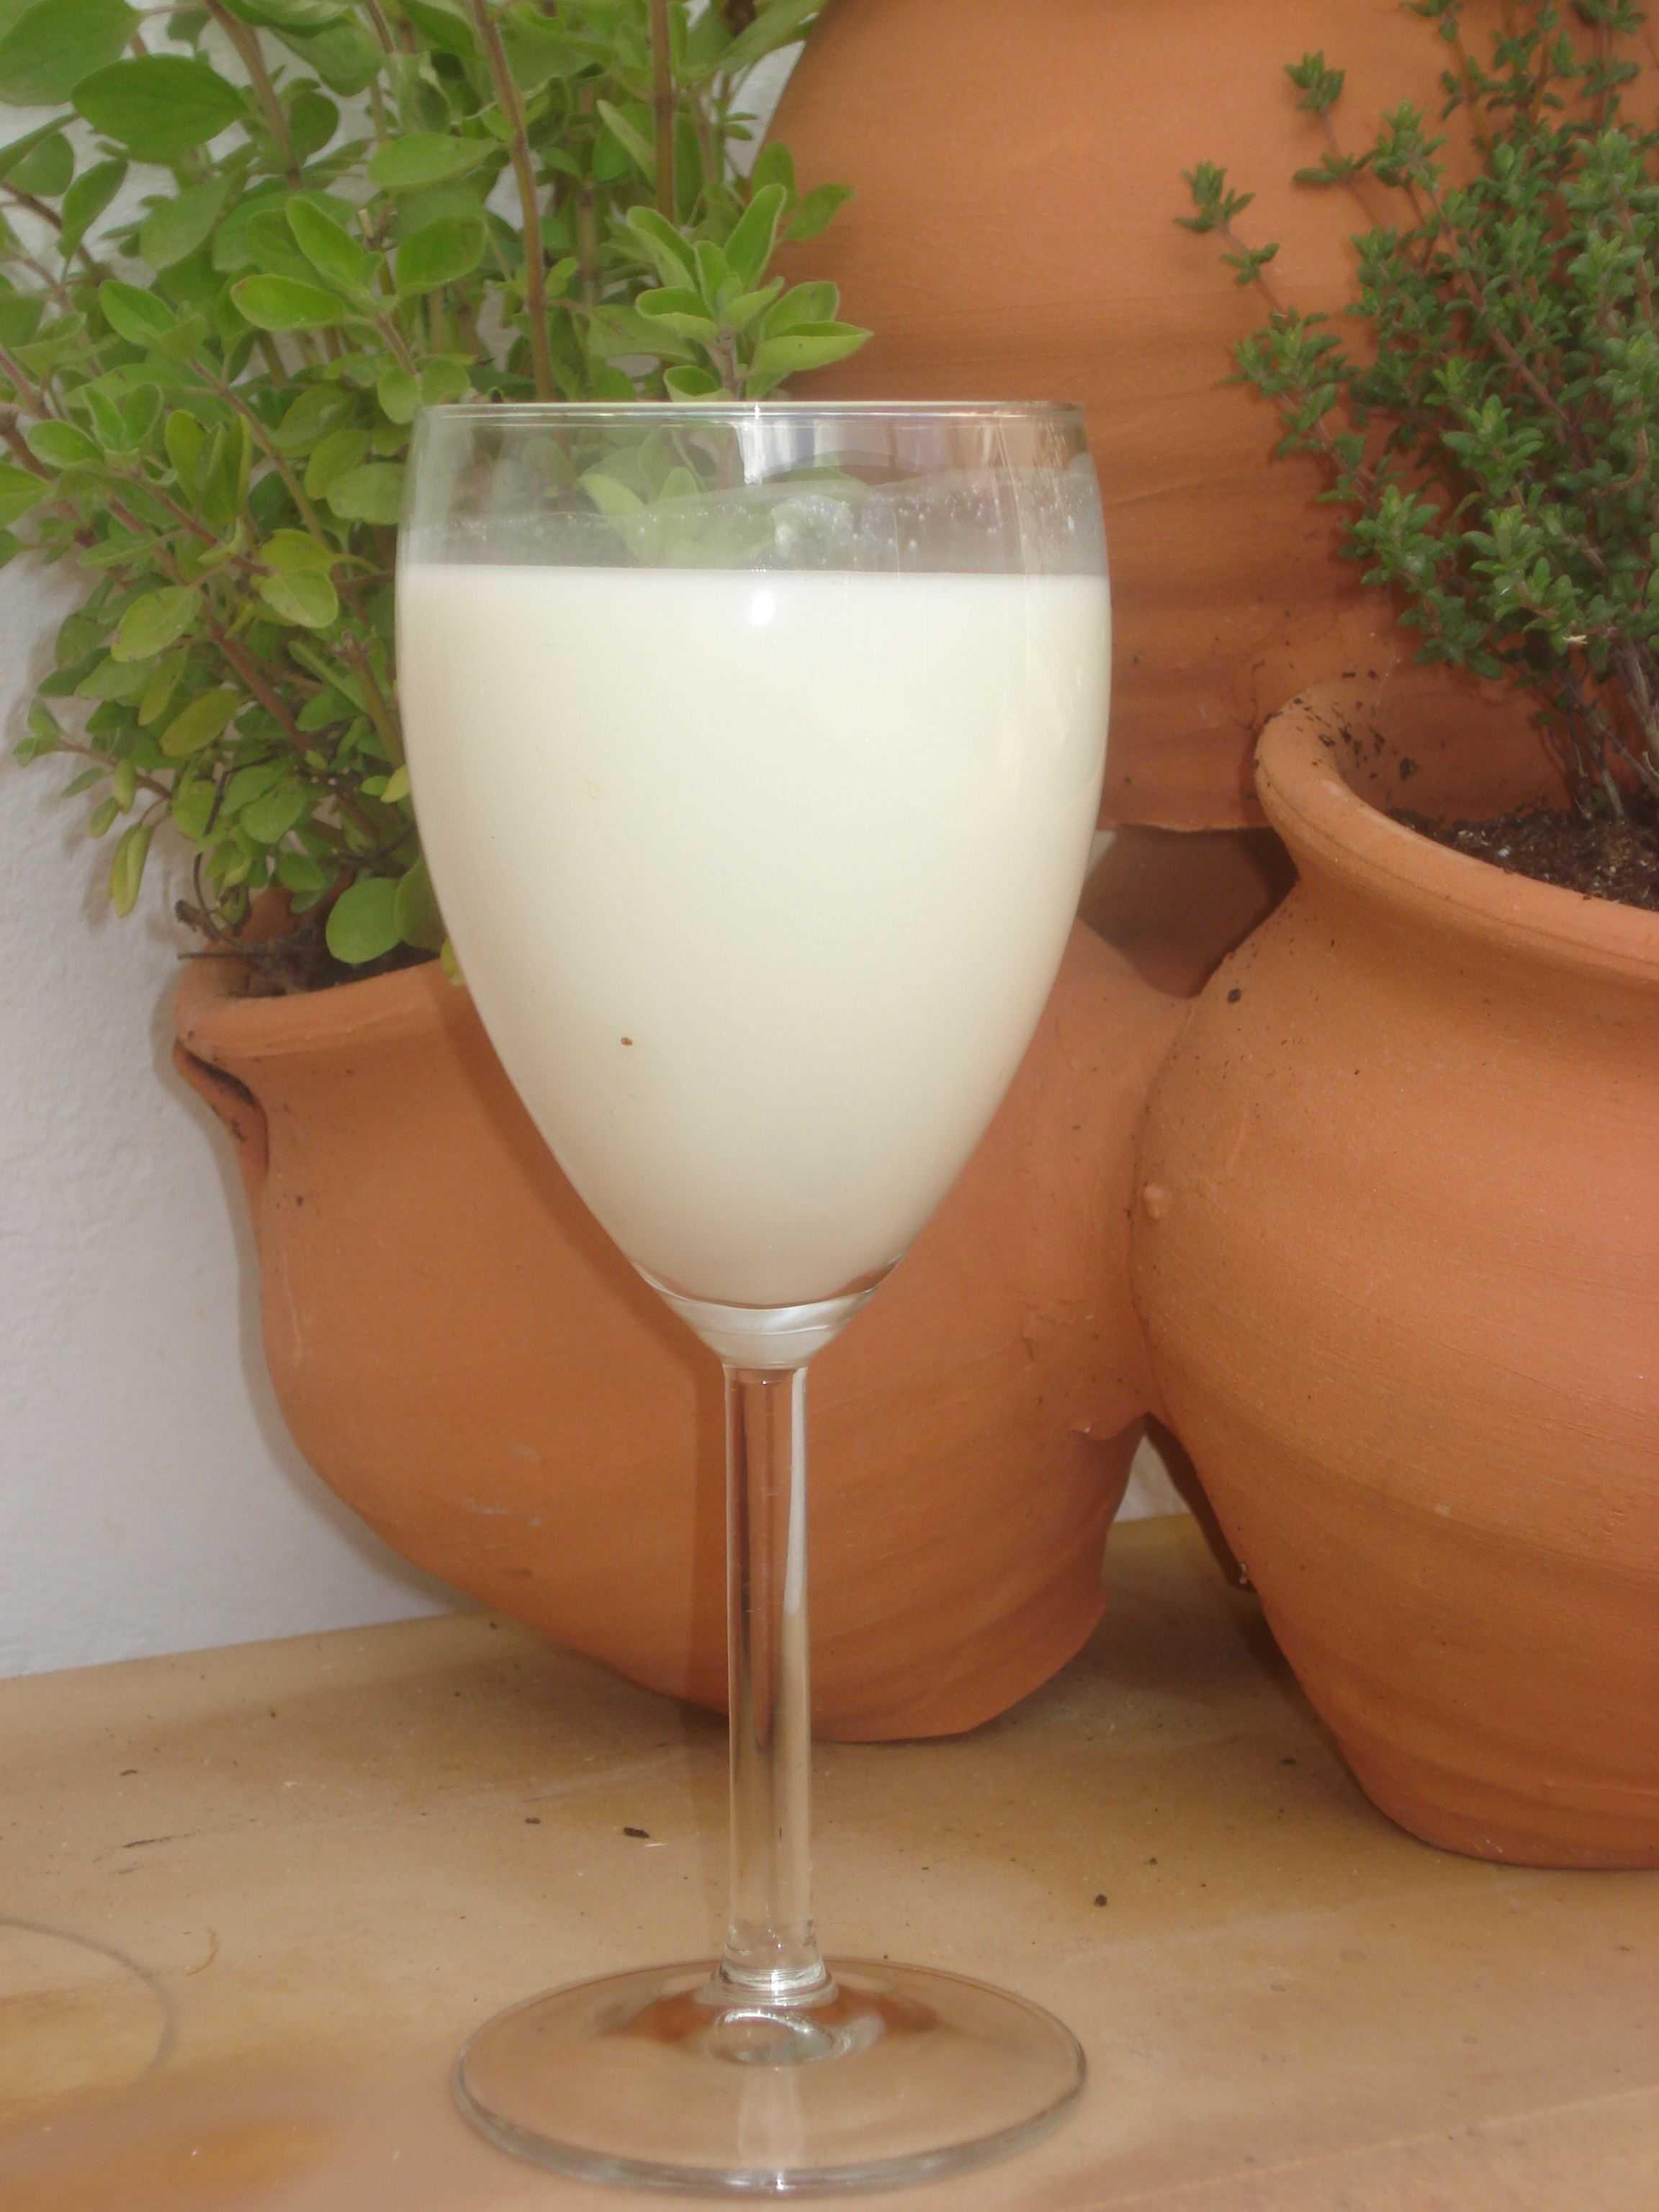 Krönika: Färsk(are) mjölk!!